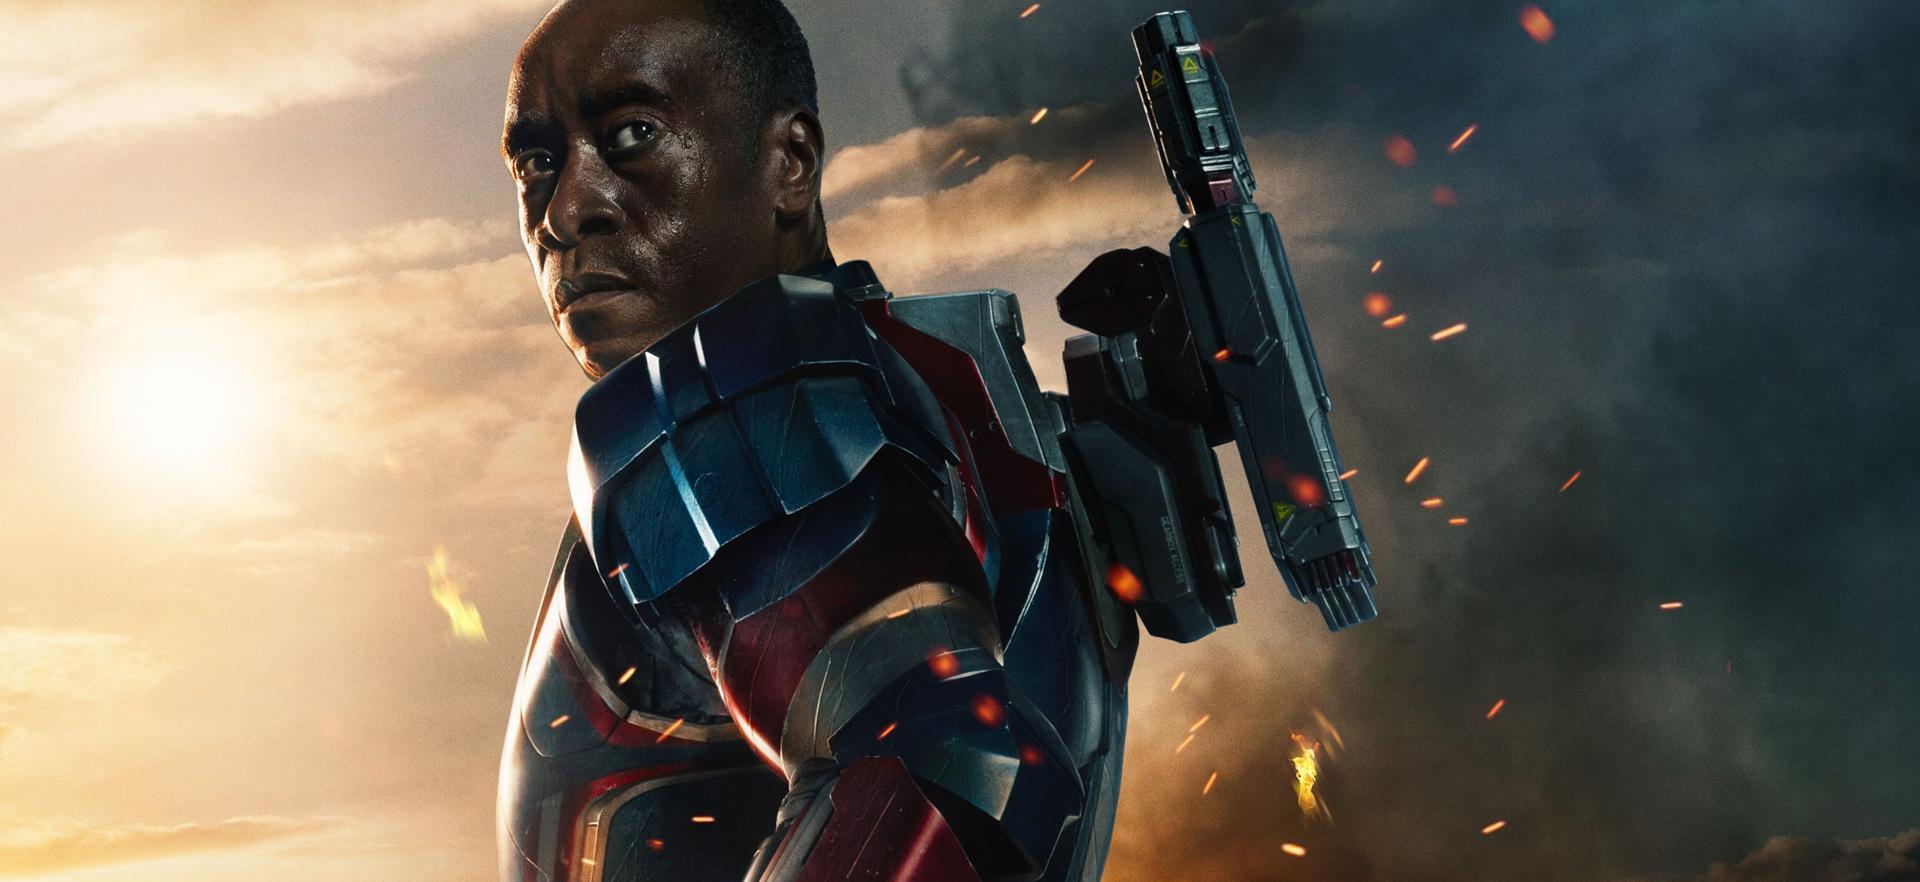 iron-man-3-james-rhodes-as-iron-patriot-hd-wallpaper.jpg